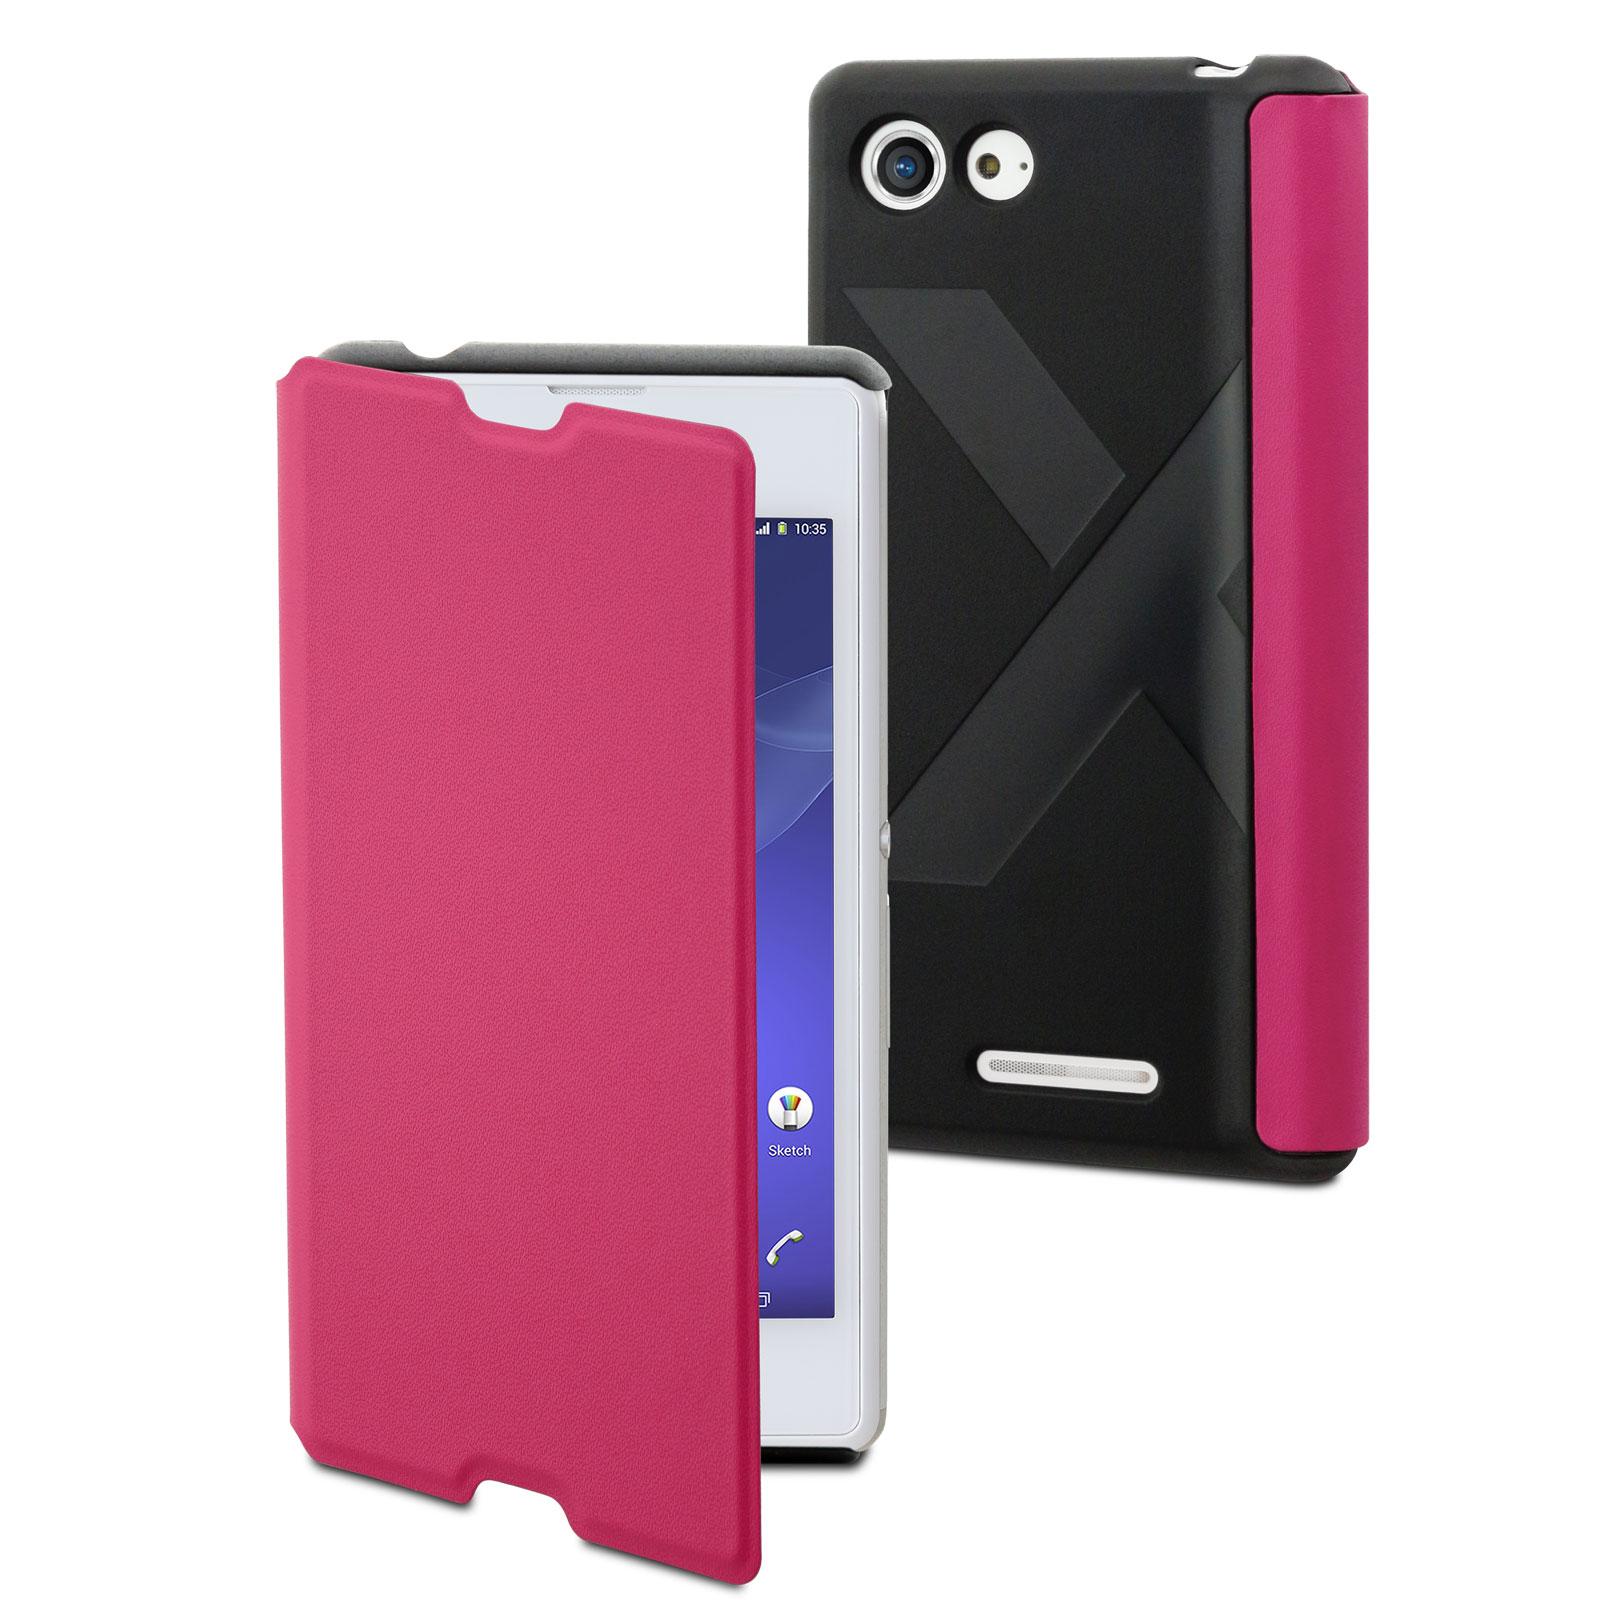 Etui téléphone Made for Xperia Etui Easy Folio Rose Sony Xperia E3 Etui de protection à clapet pour Sony Xperia E3